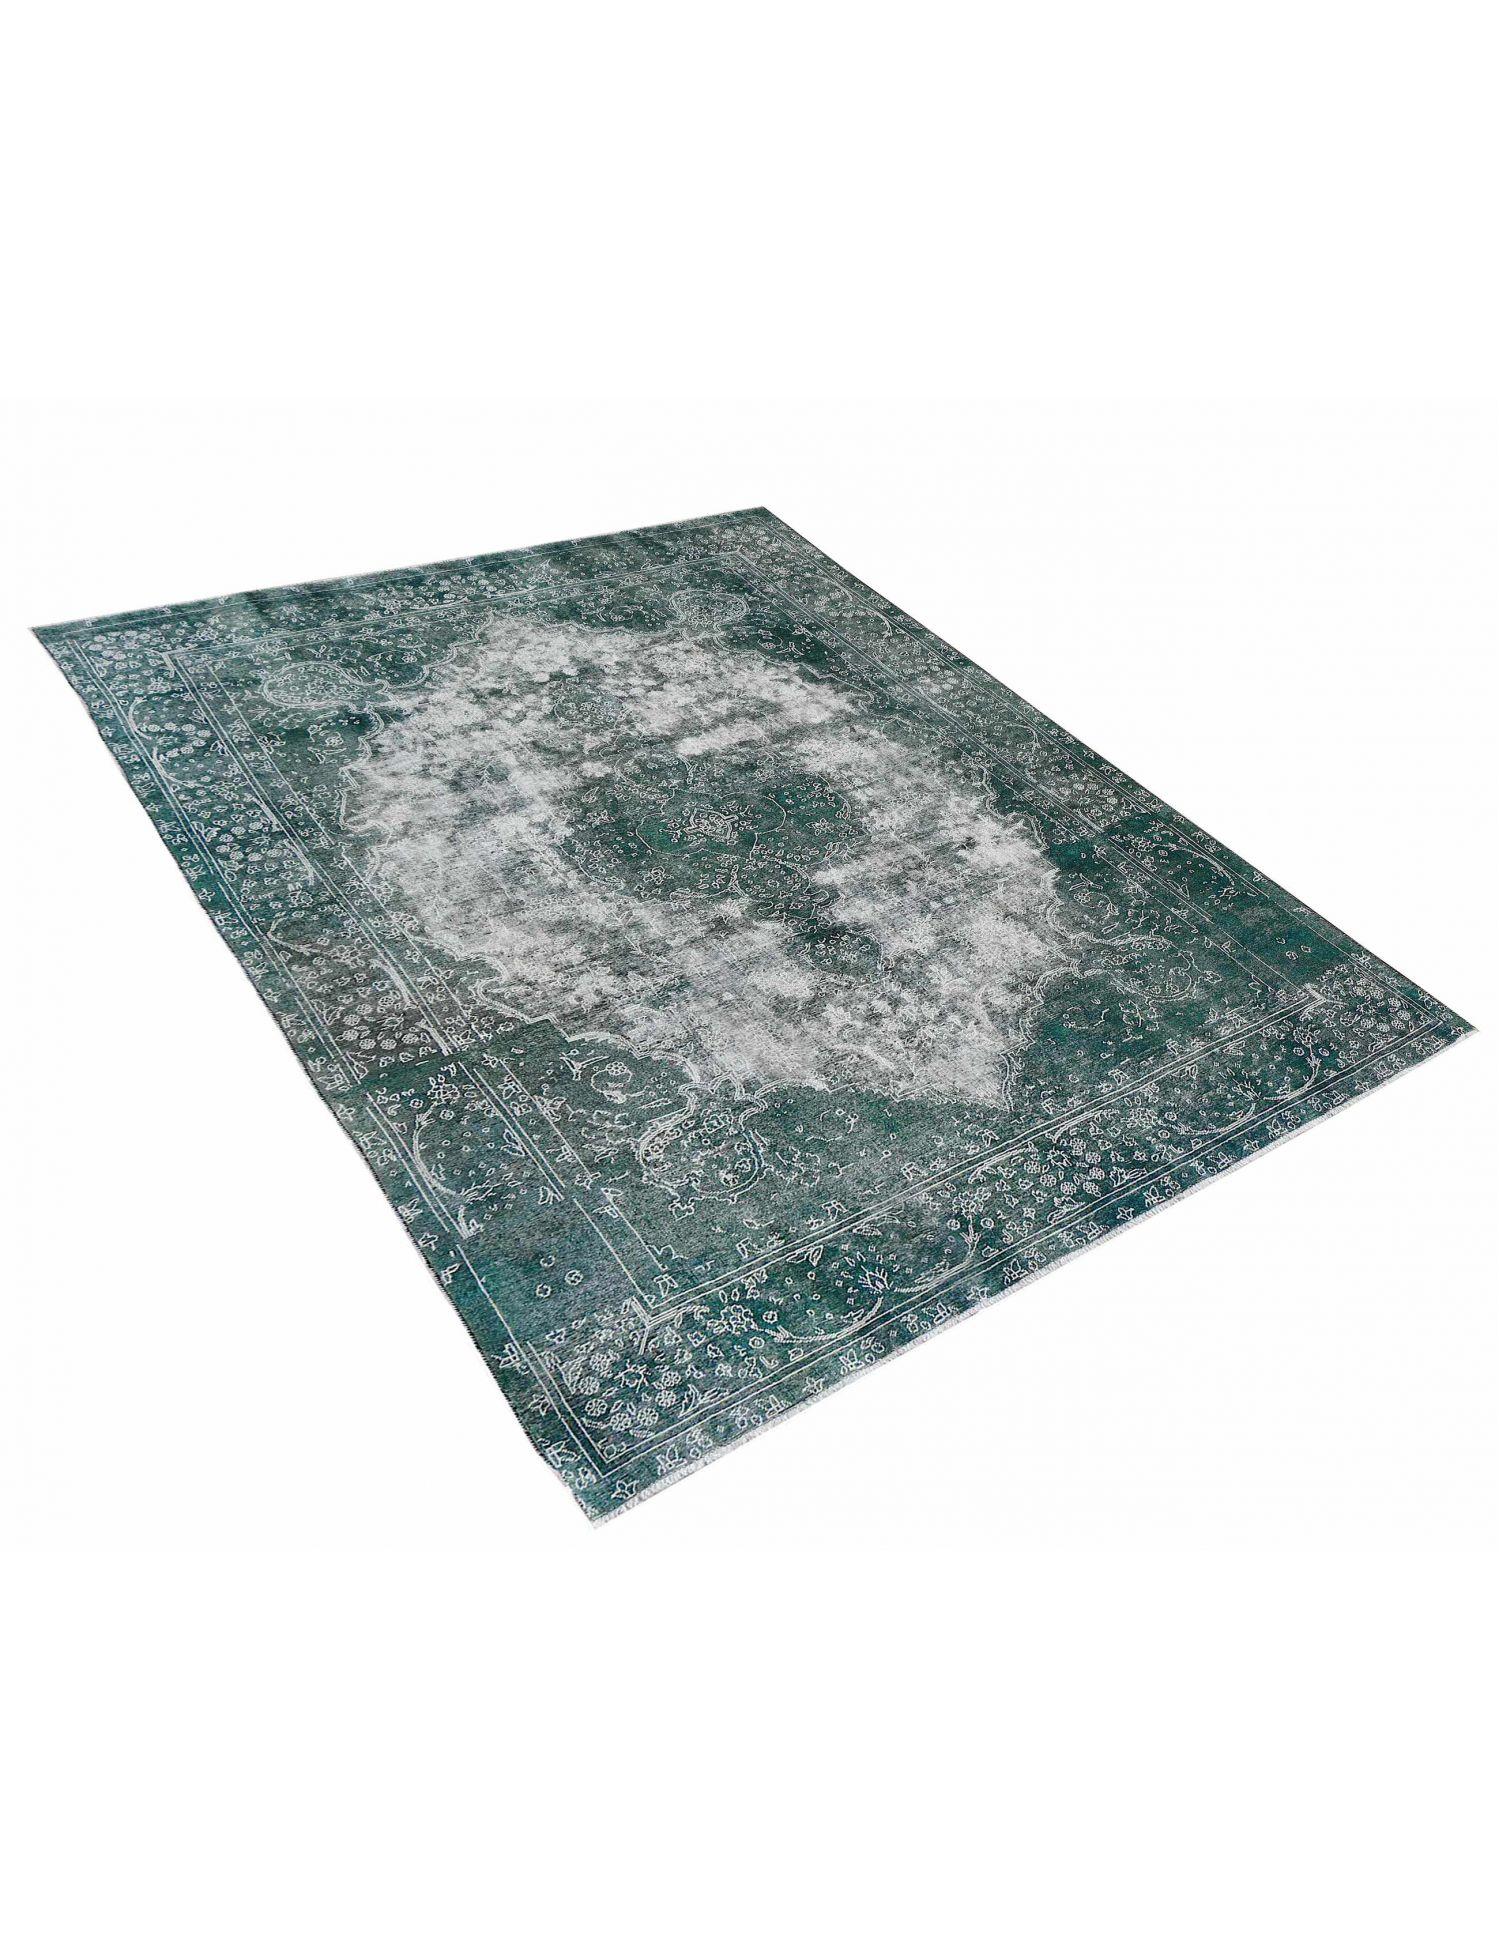 Vintage Perserteppich  grau <br/>335 x 238 cm